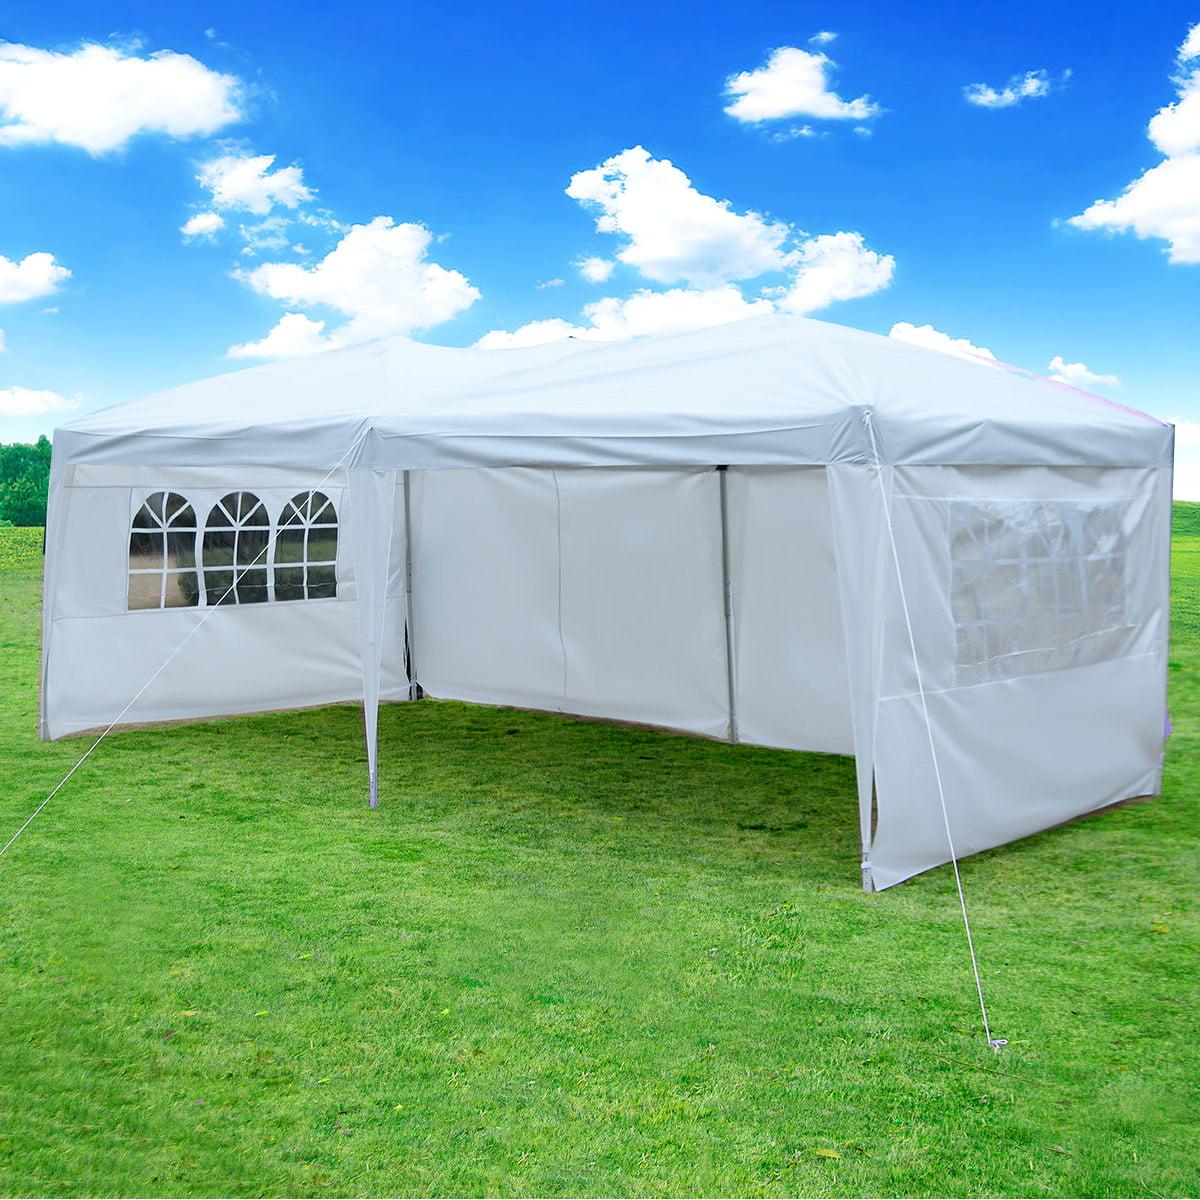 eWarehouseDirect Outdoor 10�X 20� EZ POP UP Tent Gazebo Wedding Party Folding Canopy Pavilion New by